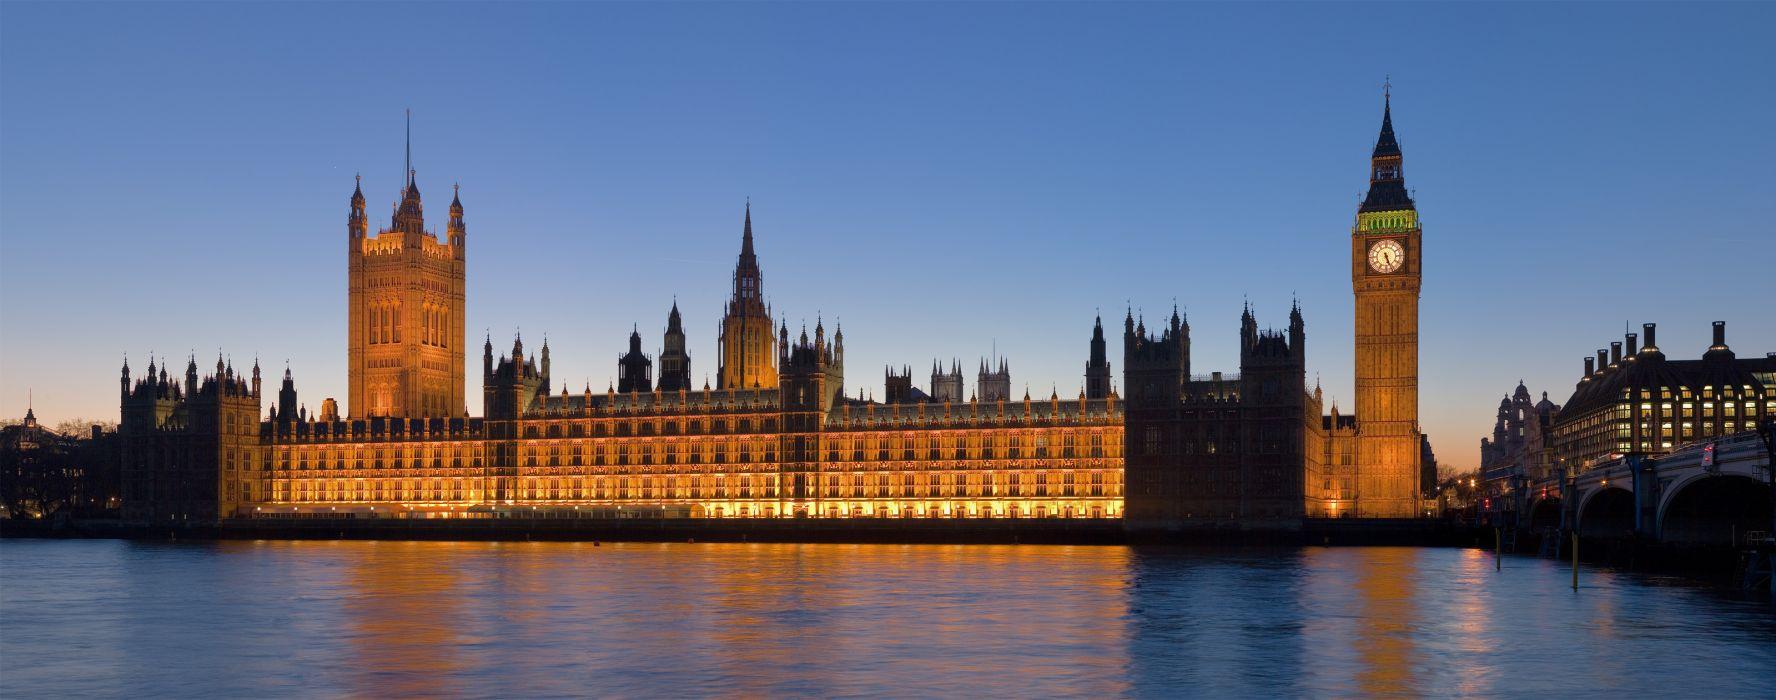 London parliment big ben wallpaper